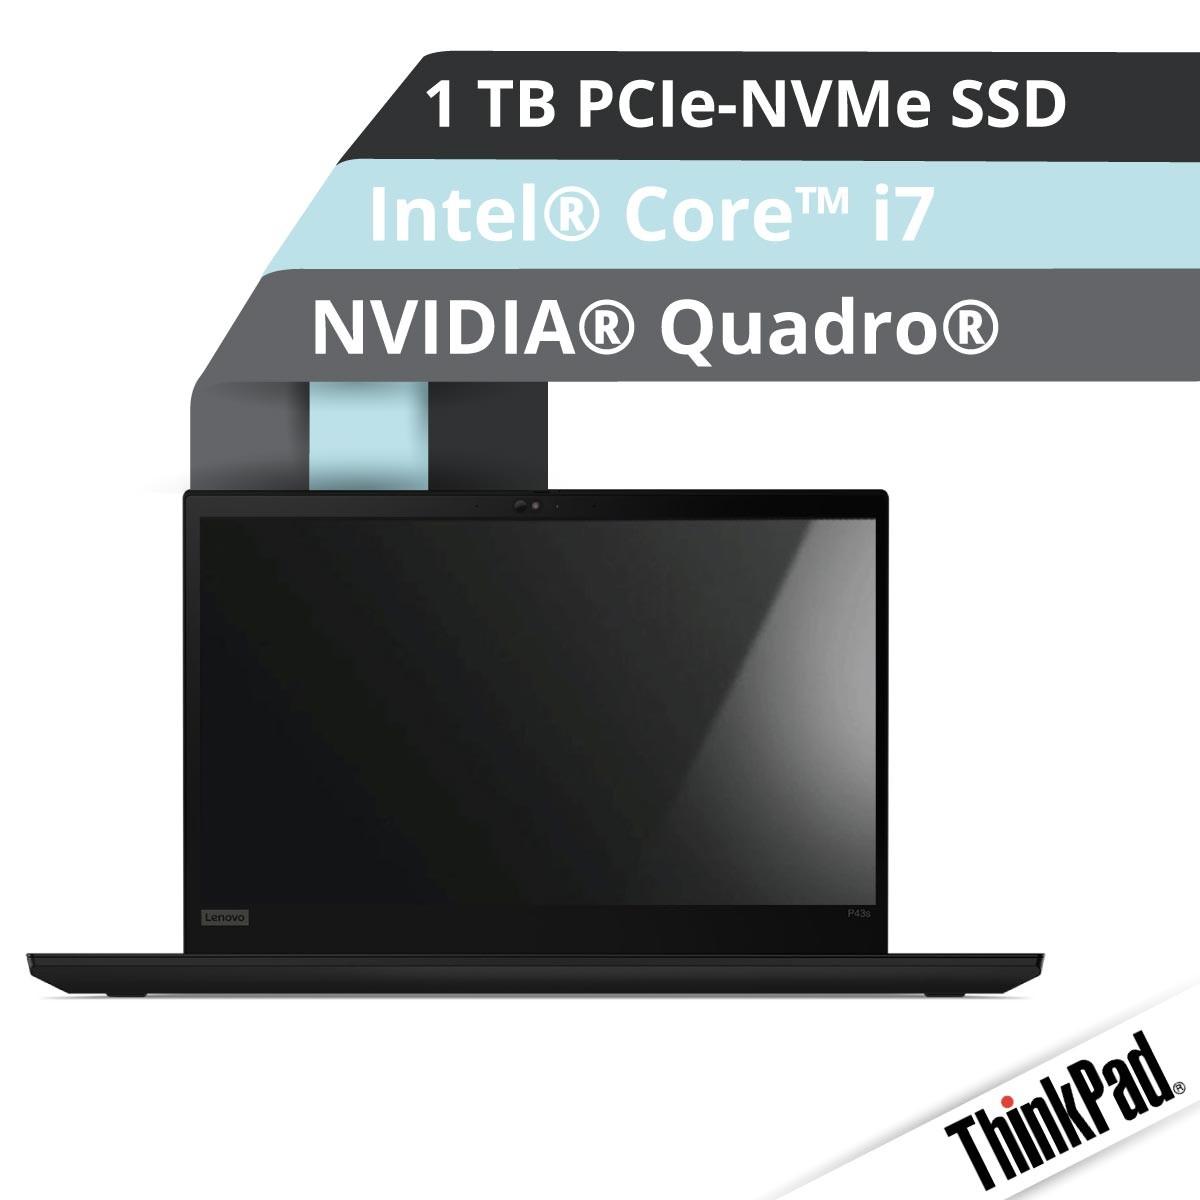 (EOL) Lenovo™ ThinkPad® P53s Workstation Modell 20N6-001R